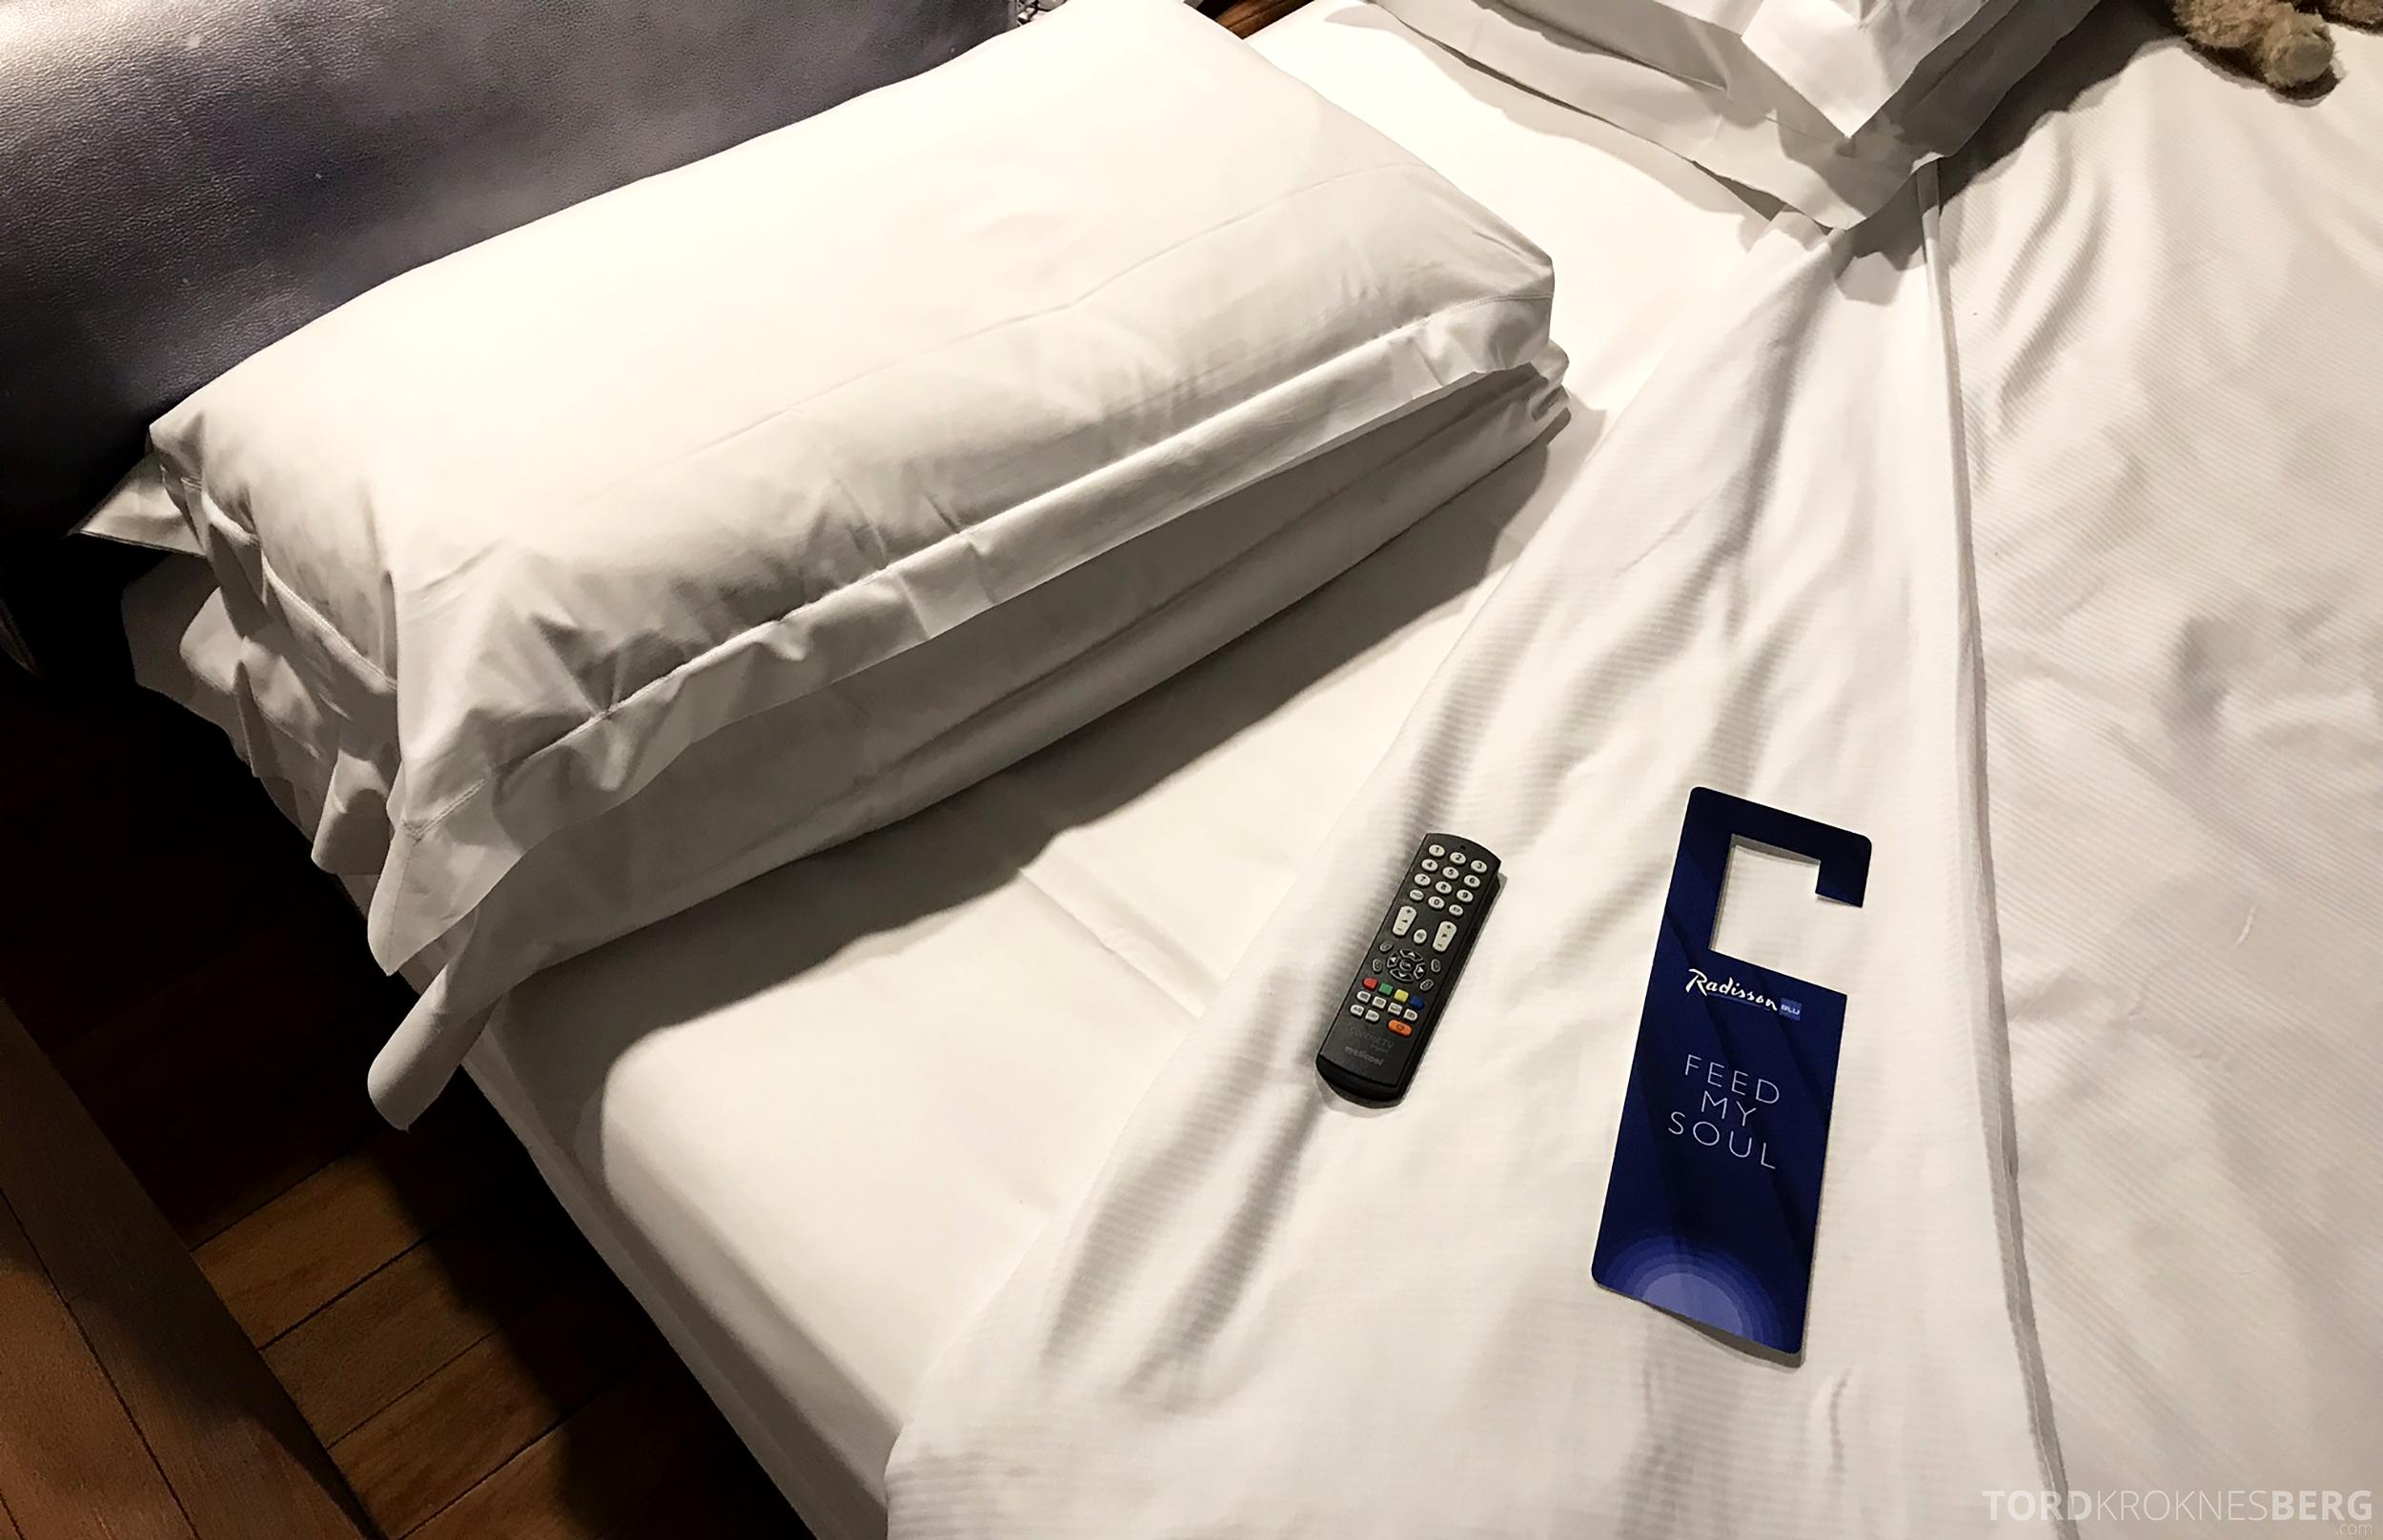 Radisson Blu Rome Hotel turndown service